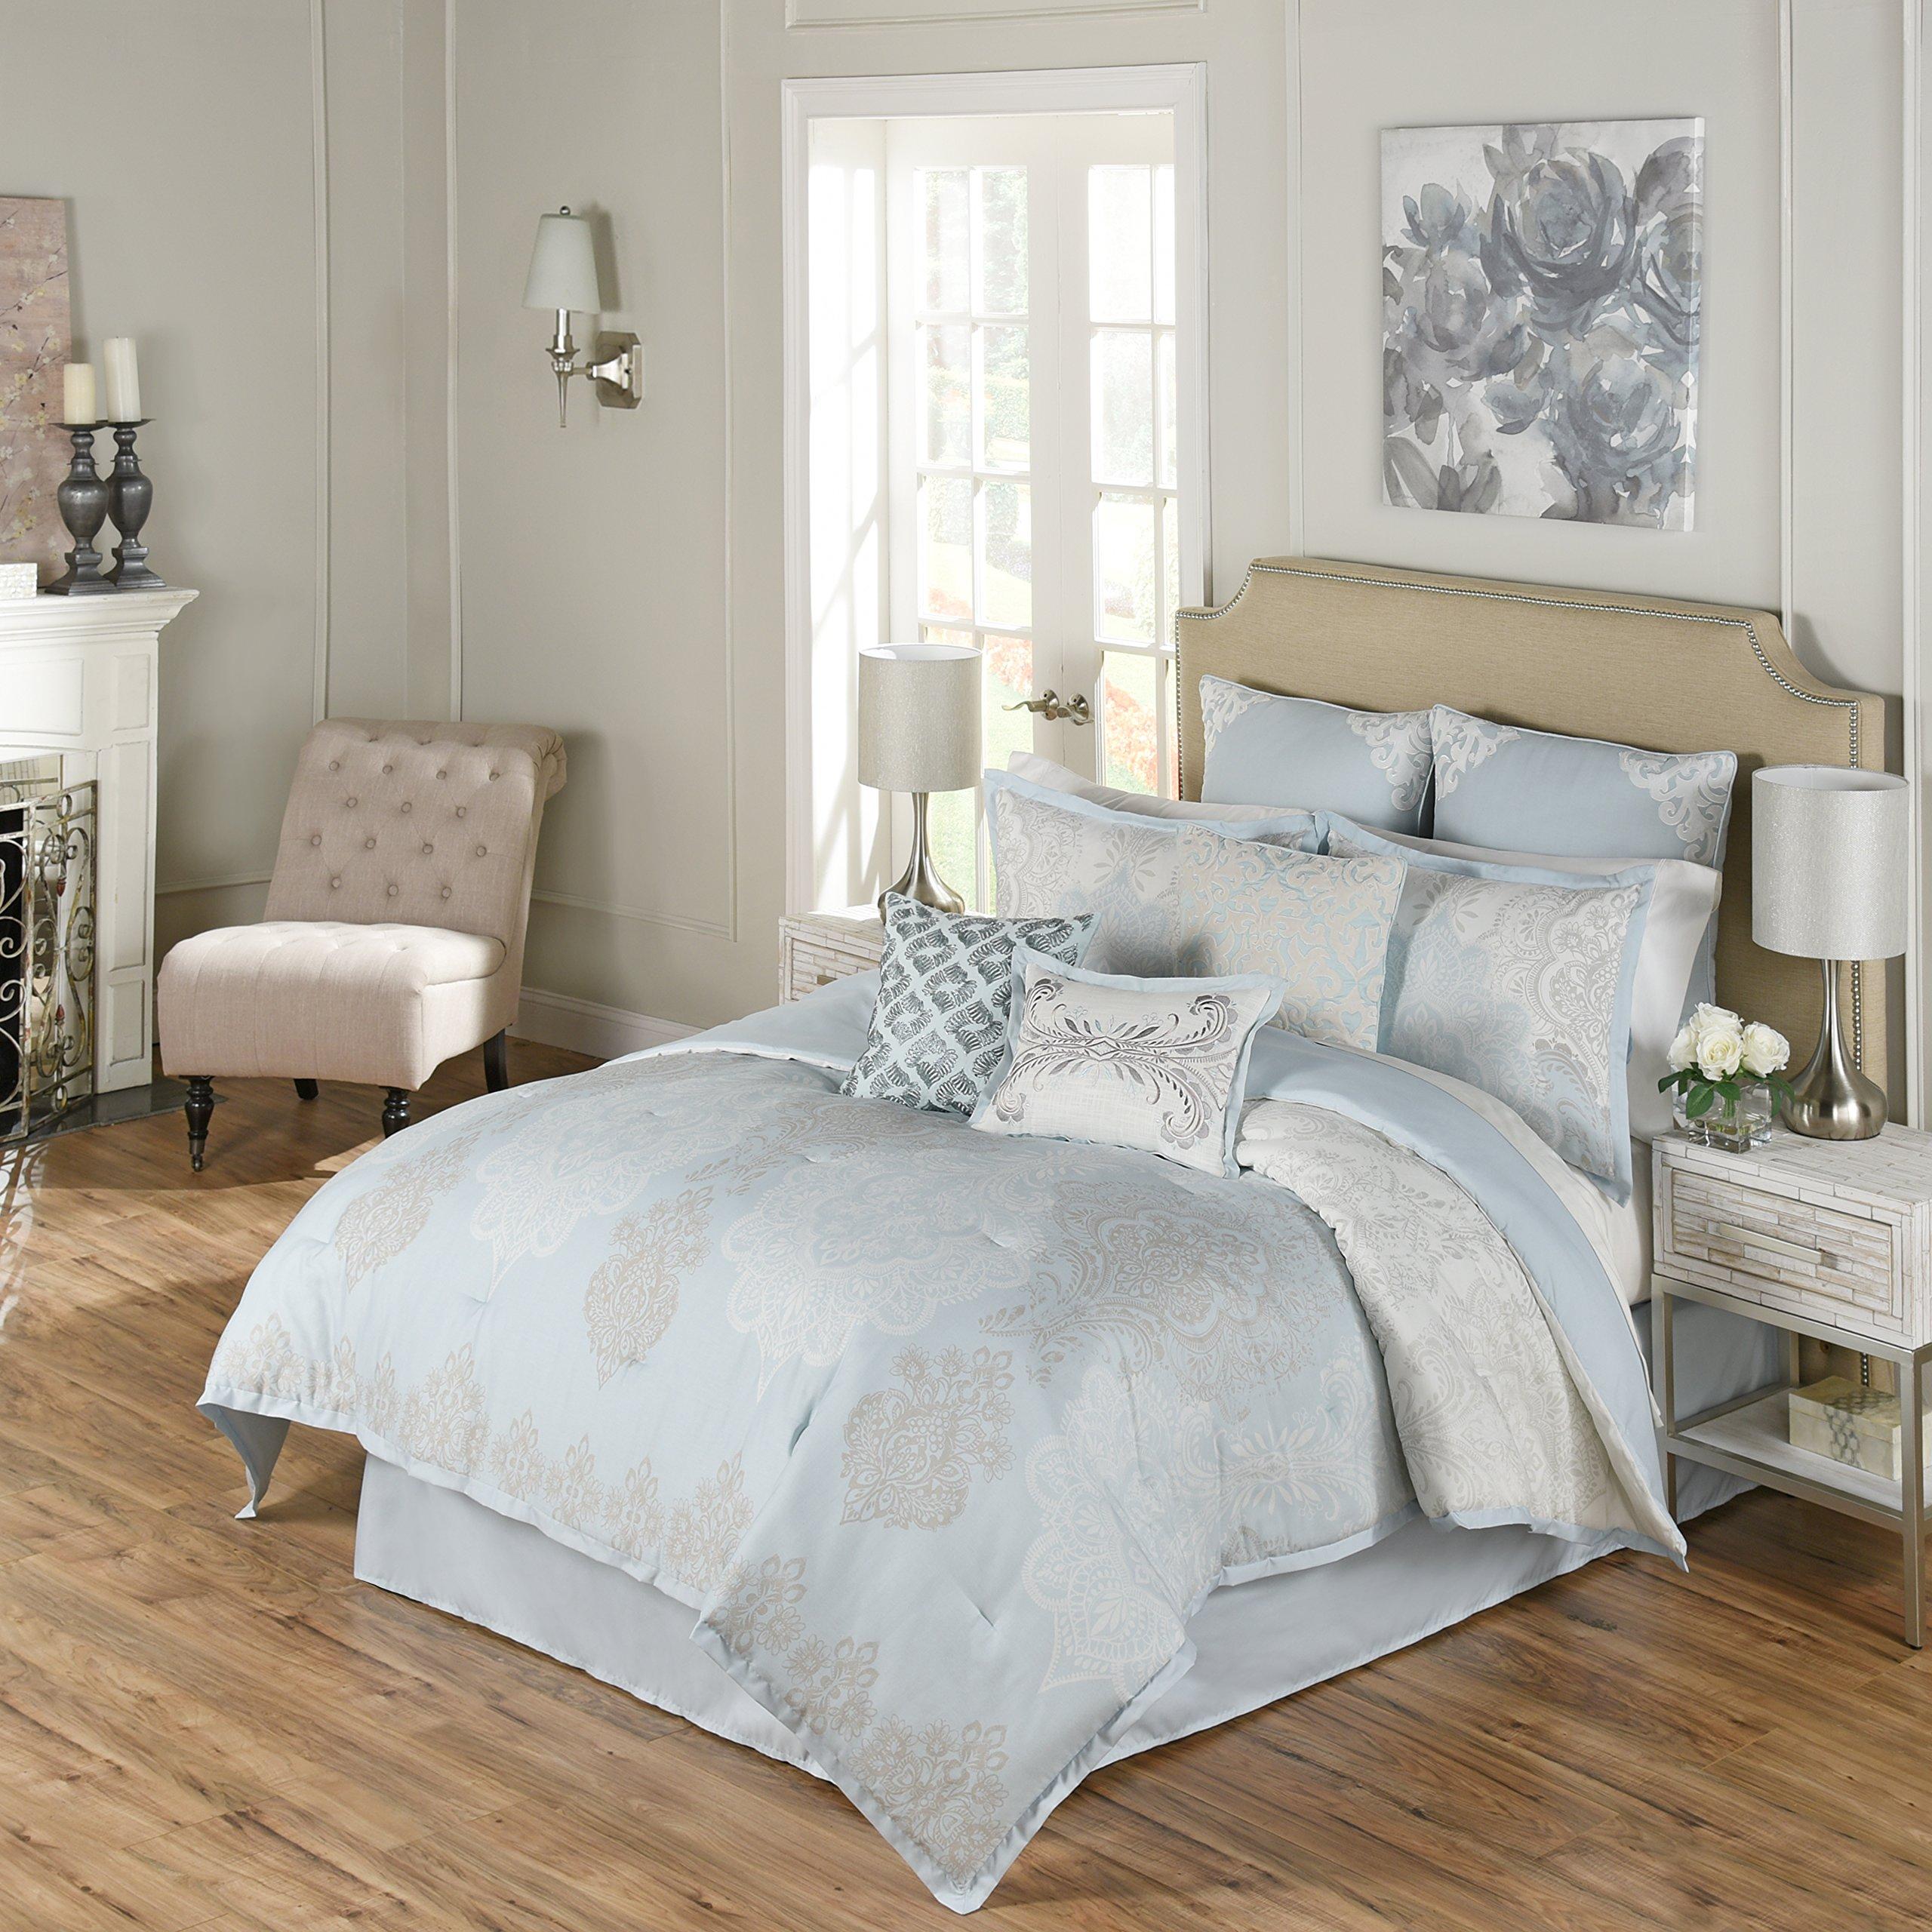 Beautyrest Arlee 4-Piece Comforter Set, King, Spa